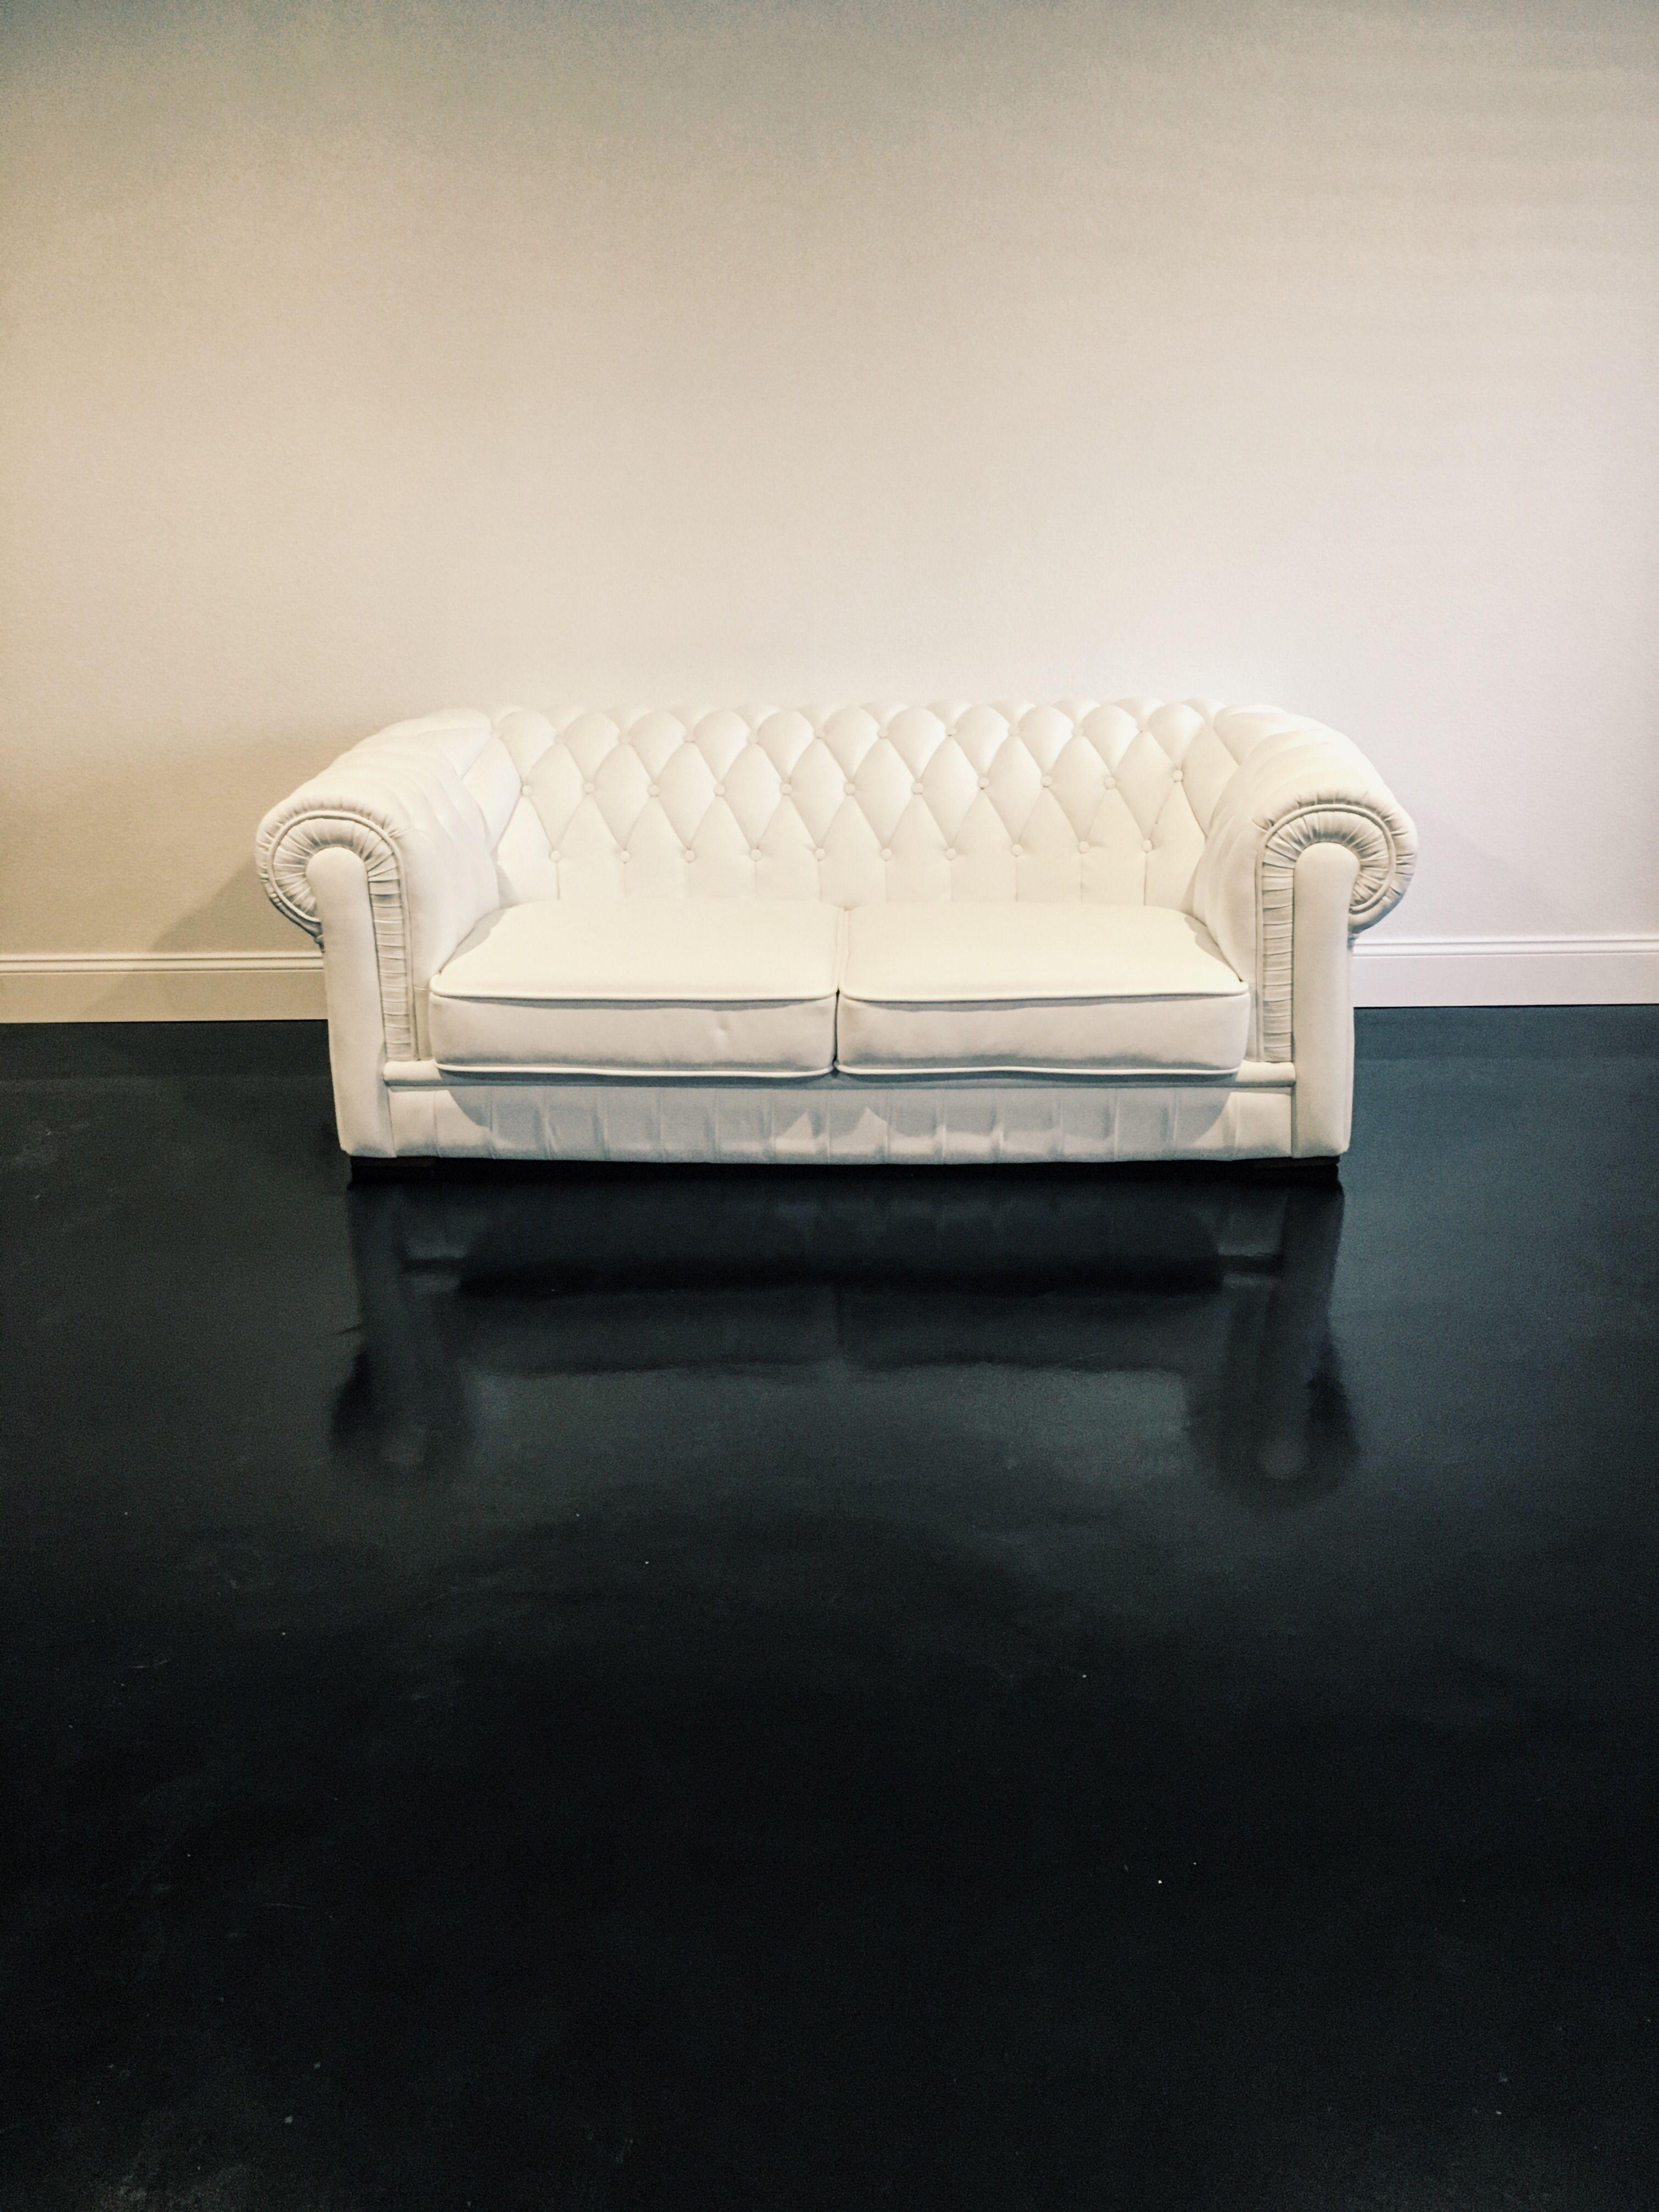 Terrific White Sofa On Satin Finish Black Floor Its The Inside Uwap Interior Chair Design Uwaporg